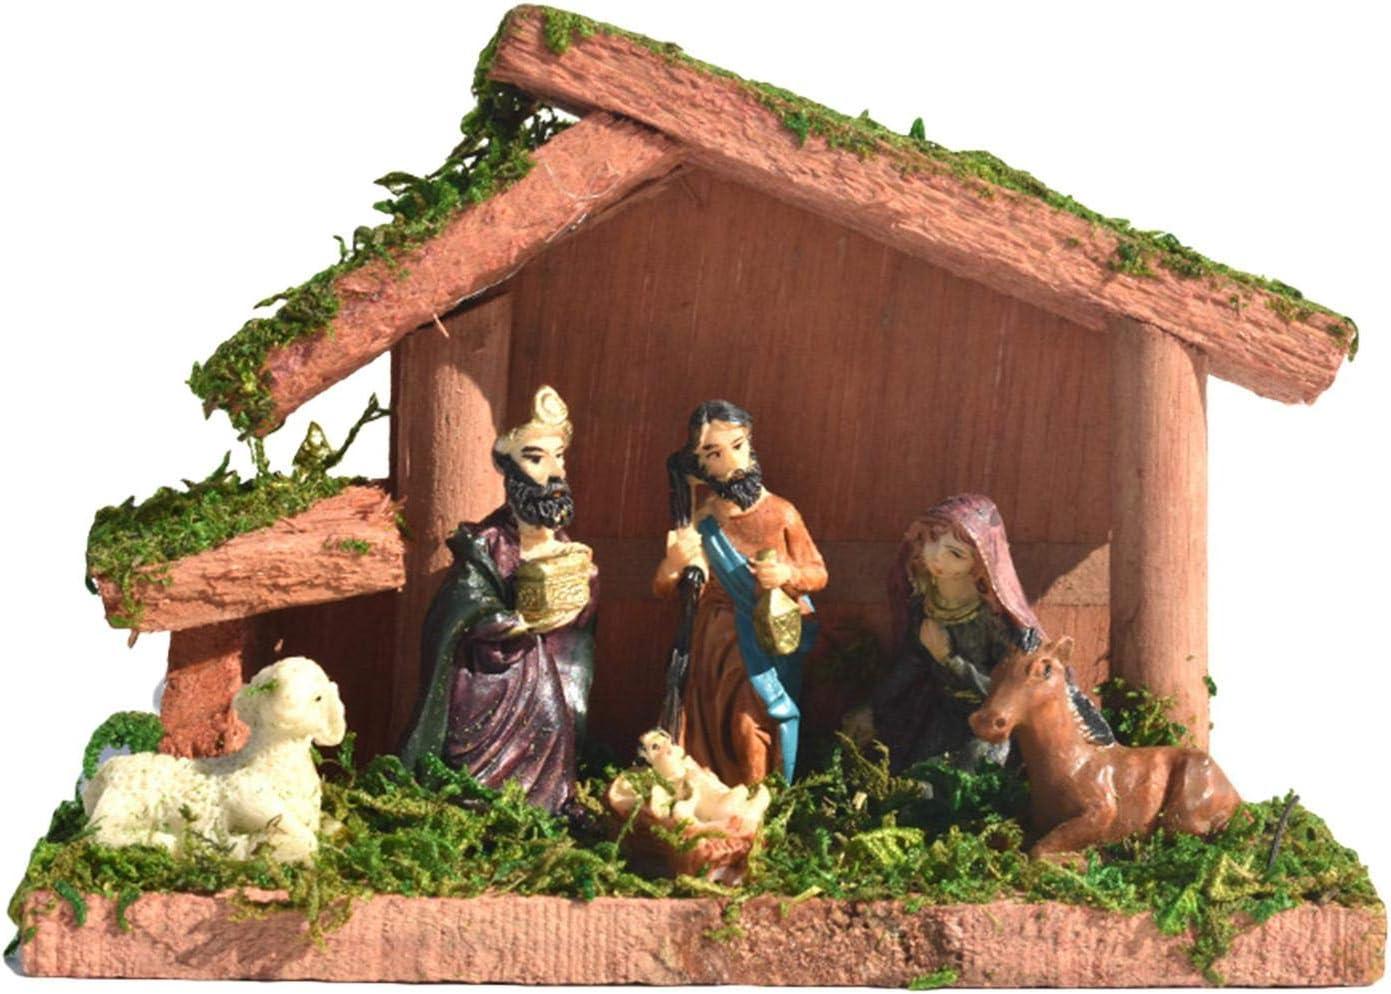 Allowevt Table Top Nativity Scene Set 7 PCS Mini Resin Holy Birth Figurine Lamb Horse Stable Farmhouse for Holiday Home Decor 6.3x2.95x4.3/Inch